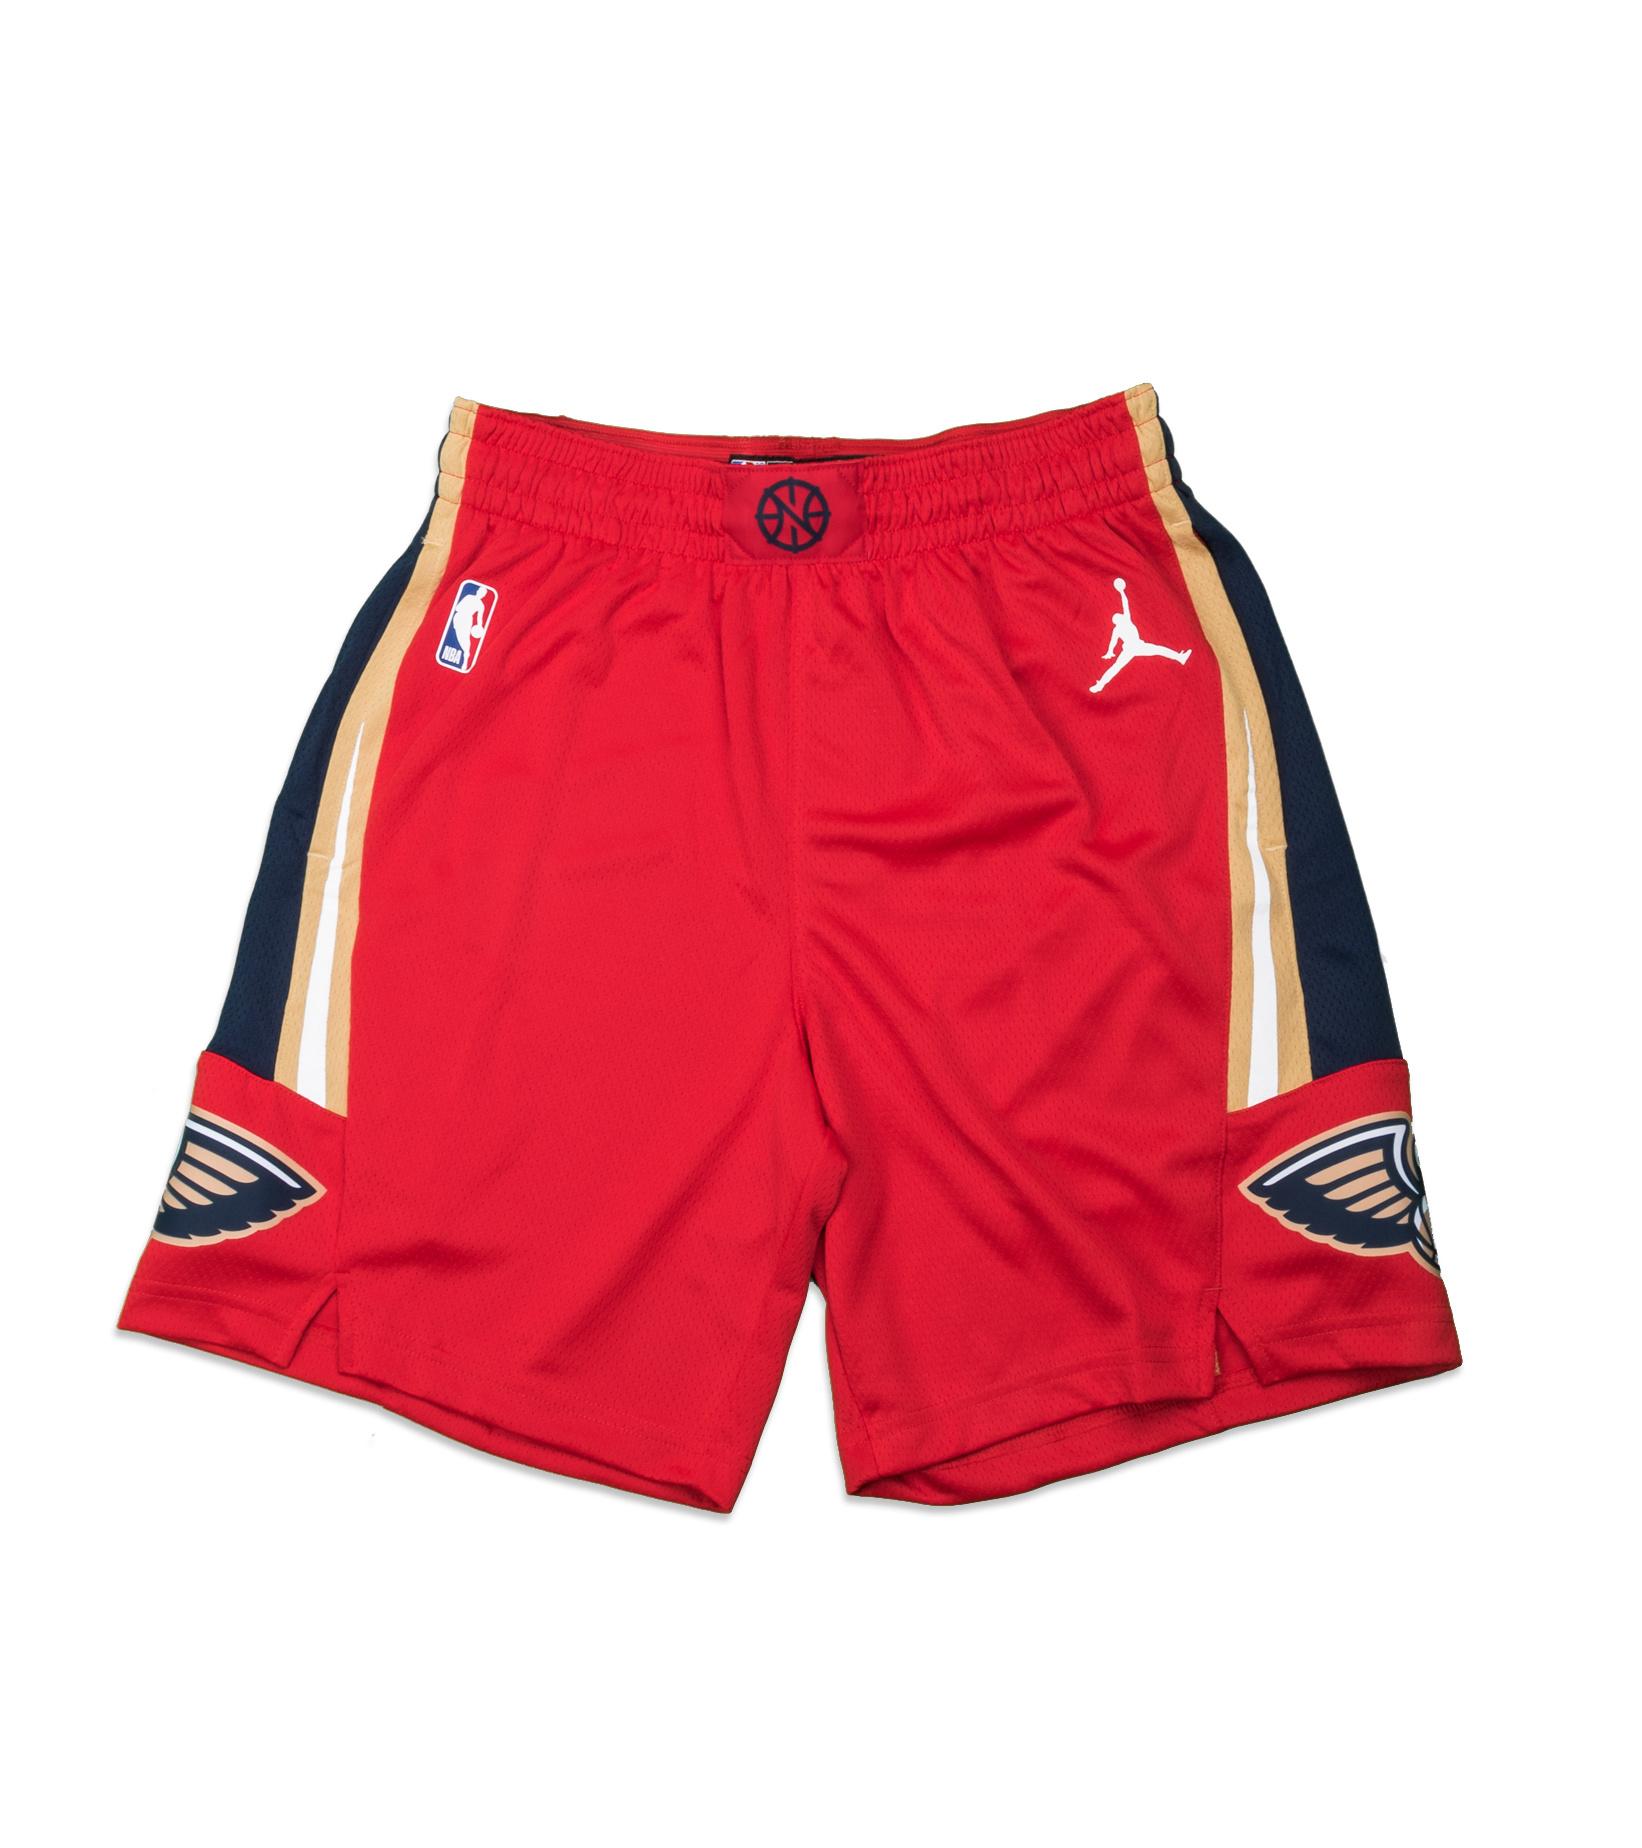 "New Orleans Pelicans Statement Edition '20 Swingman Short ""University Red/College Navy""-1"